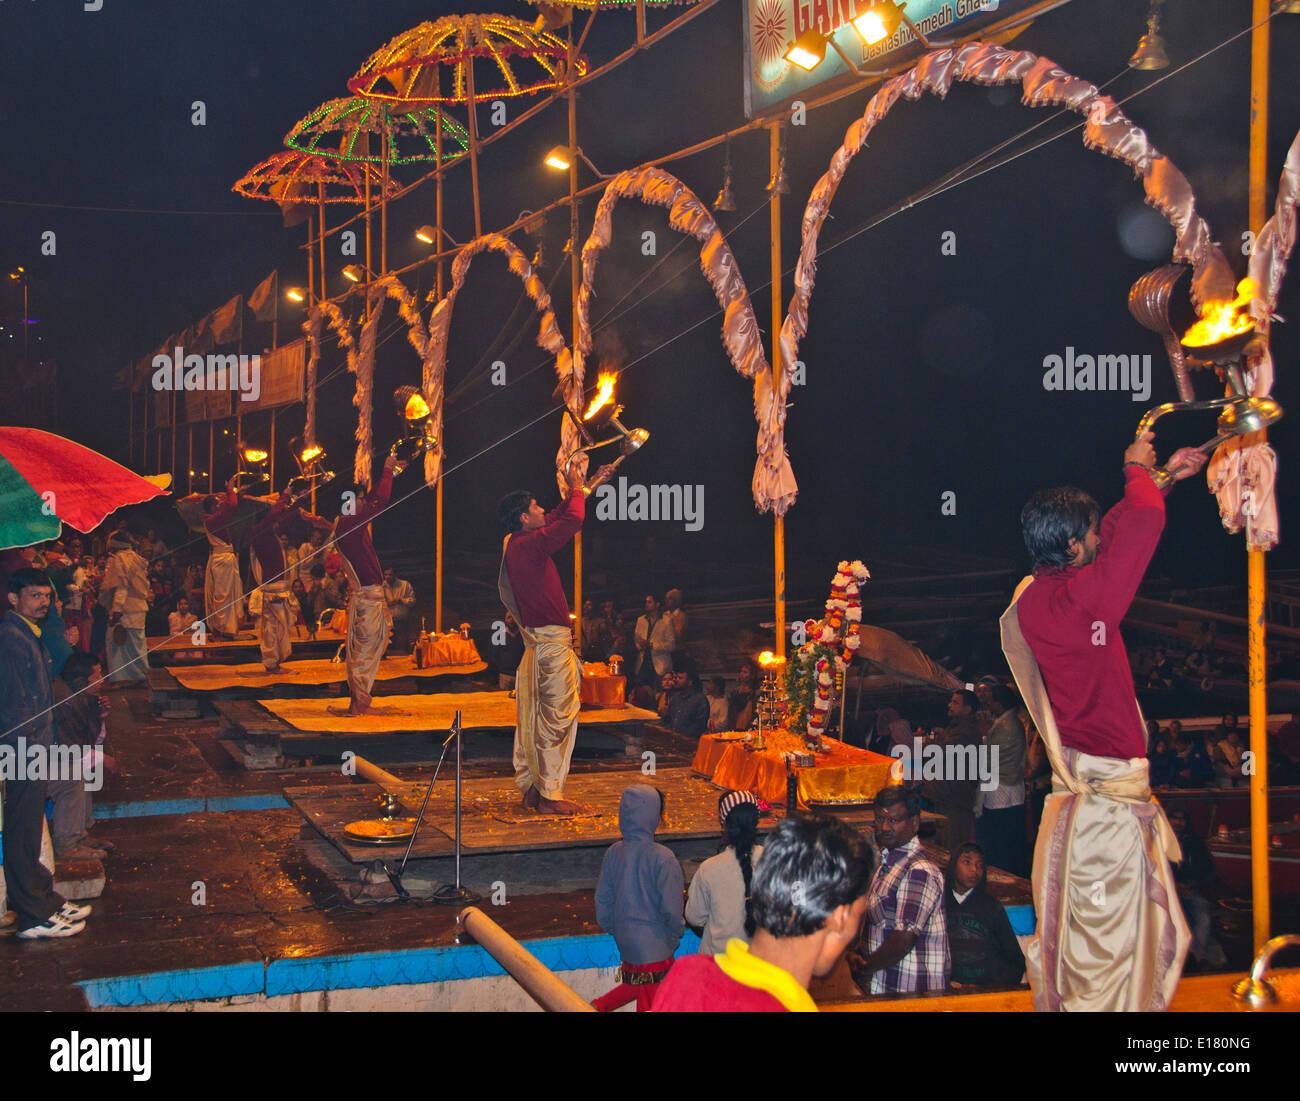 Ganga Fluß, der Ganges, Ghats, Abend Aarti Begrüßungen zum Fluss, Öllampen, Glocken, Gesänge, Varanasi, Benares, Stockfoto